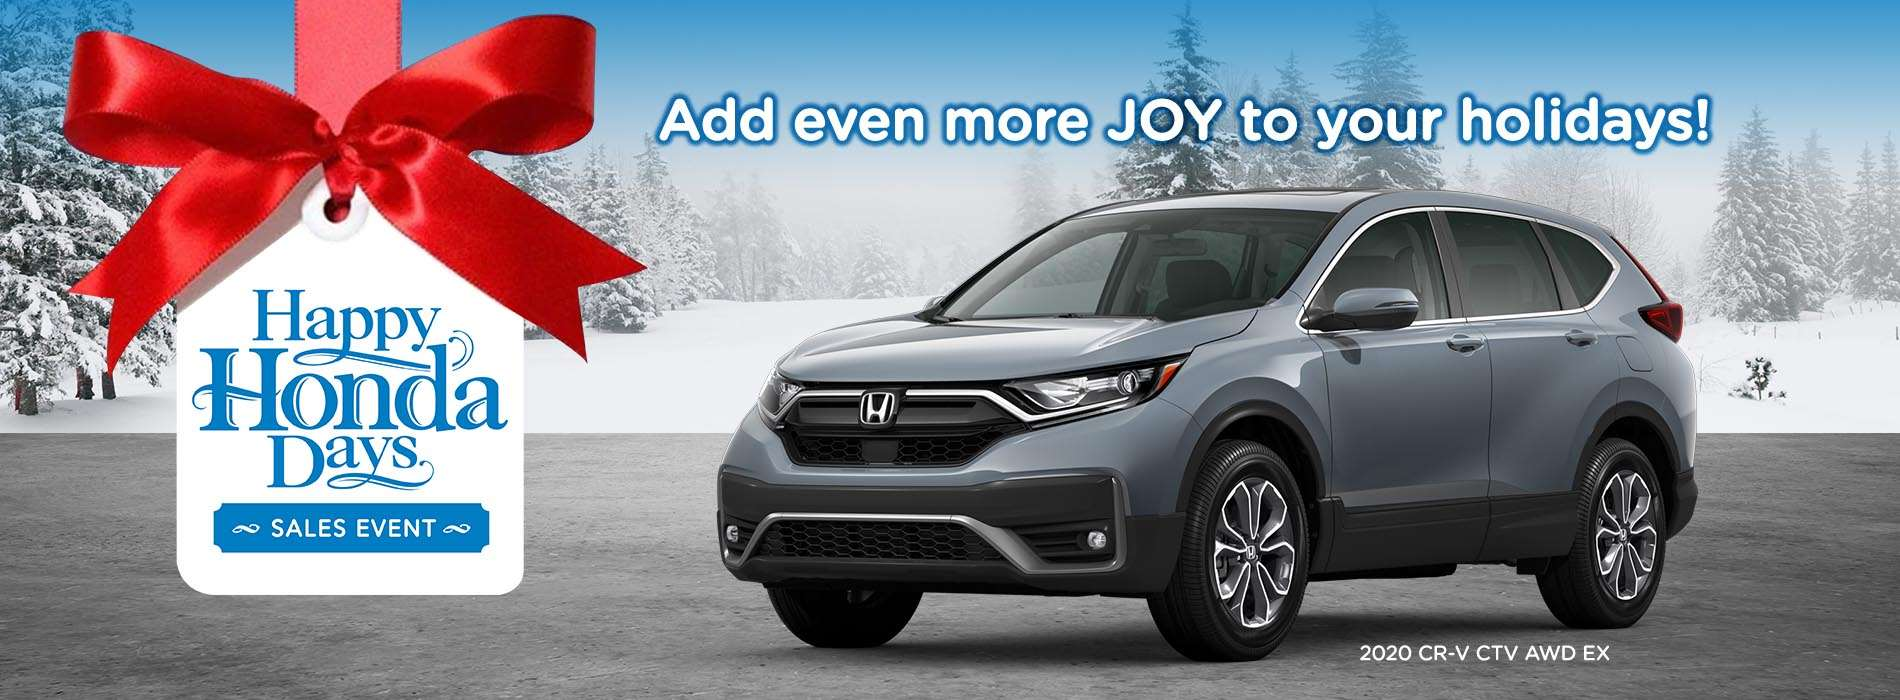 DLH - Happy Honda Days CRV - November 2020